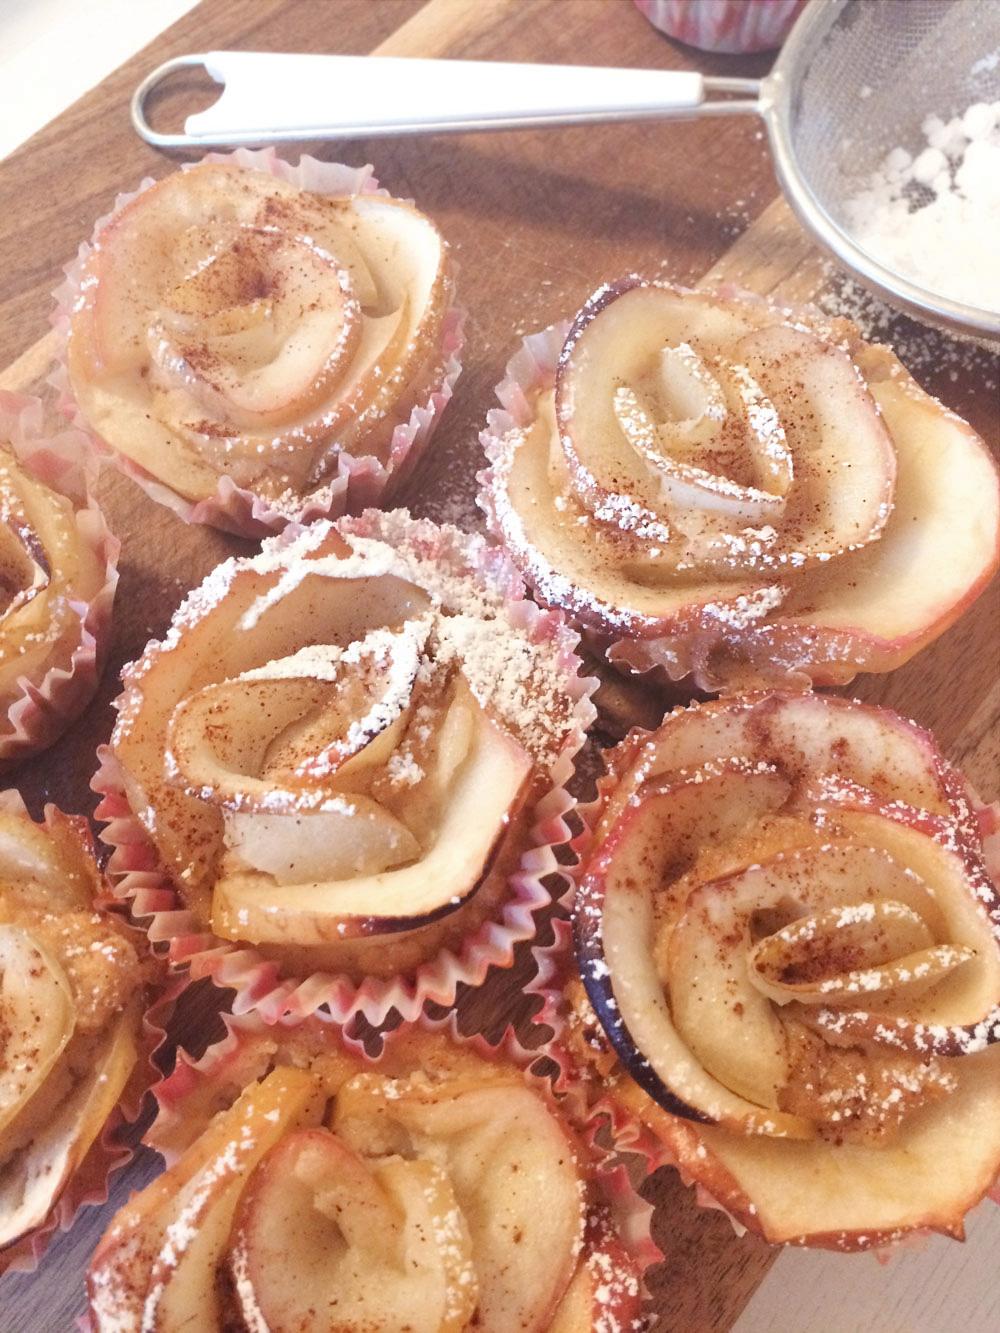 apfel-rosen-muffins-kokos-kokosmehl-gesund-fitness-lifestyle-blog-turnschuhverliebt_2